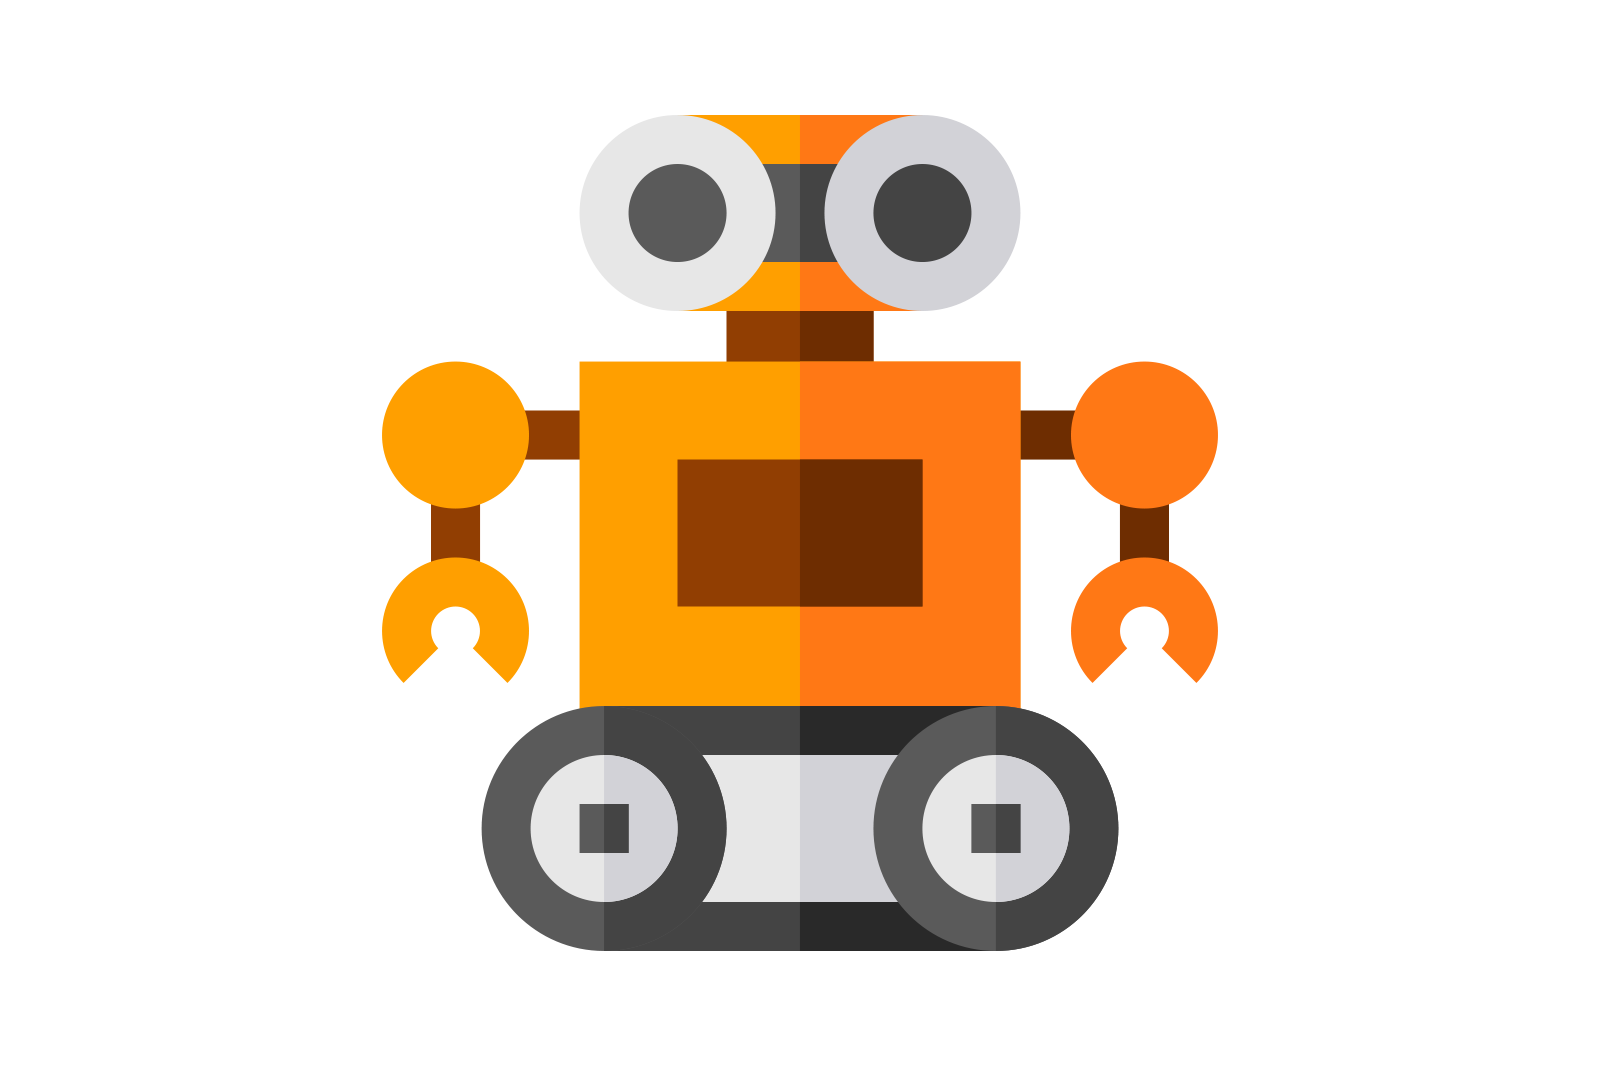 Dê adeus aos robôs!